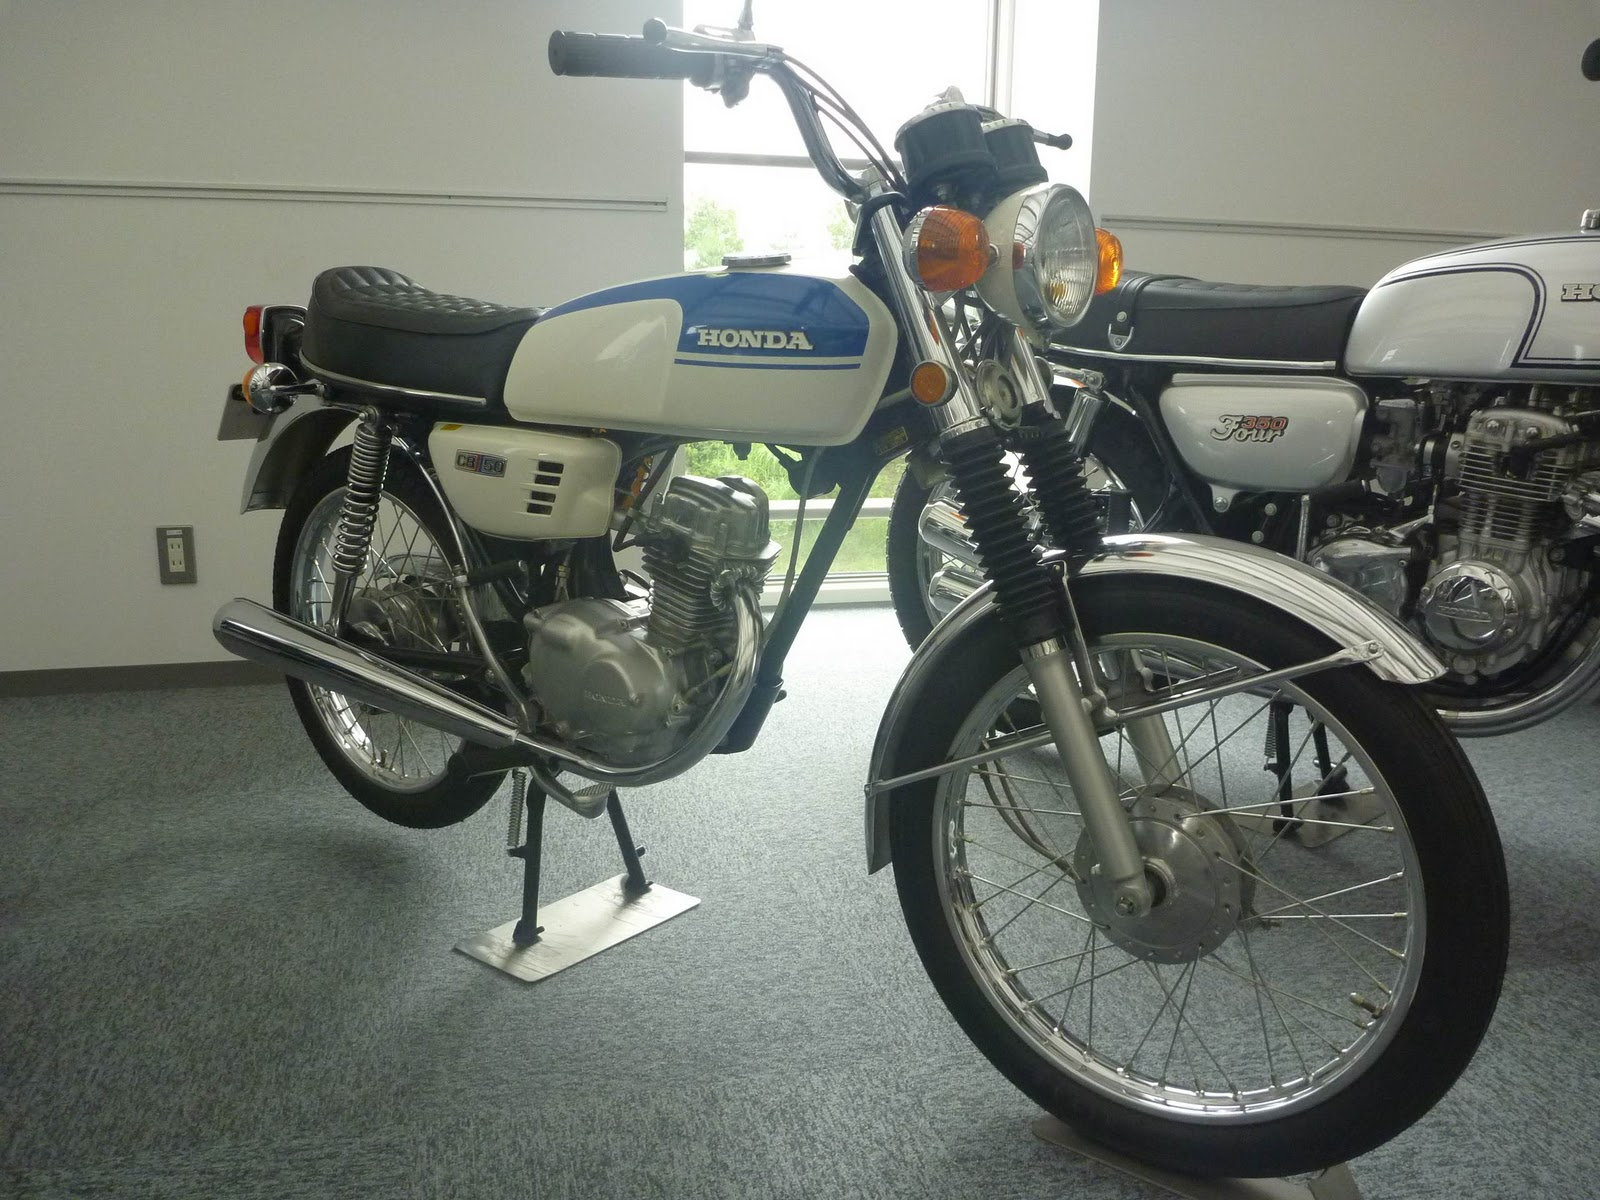 1971 Honda Benly CB50 Motegi collection